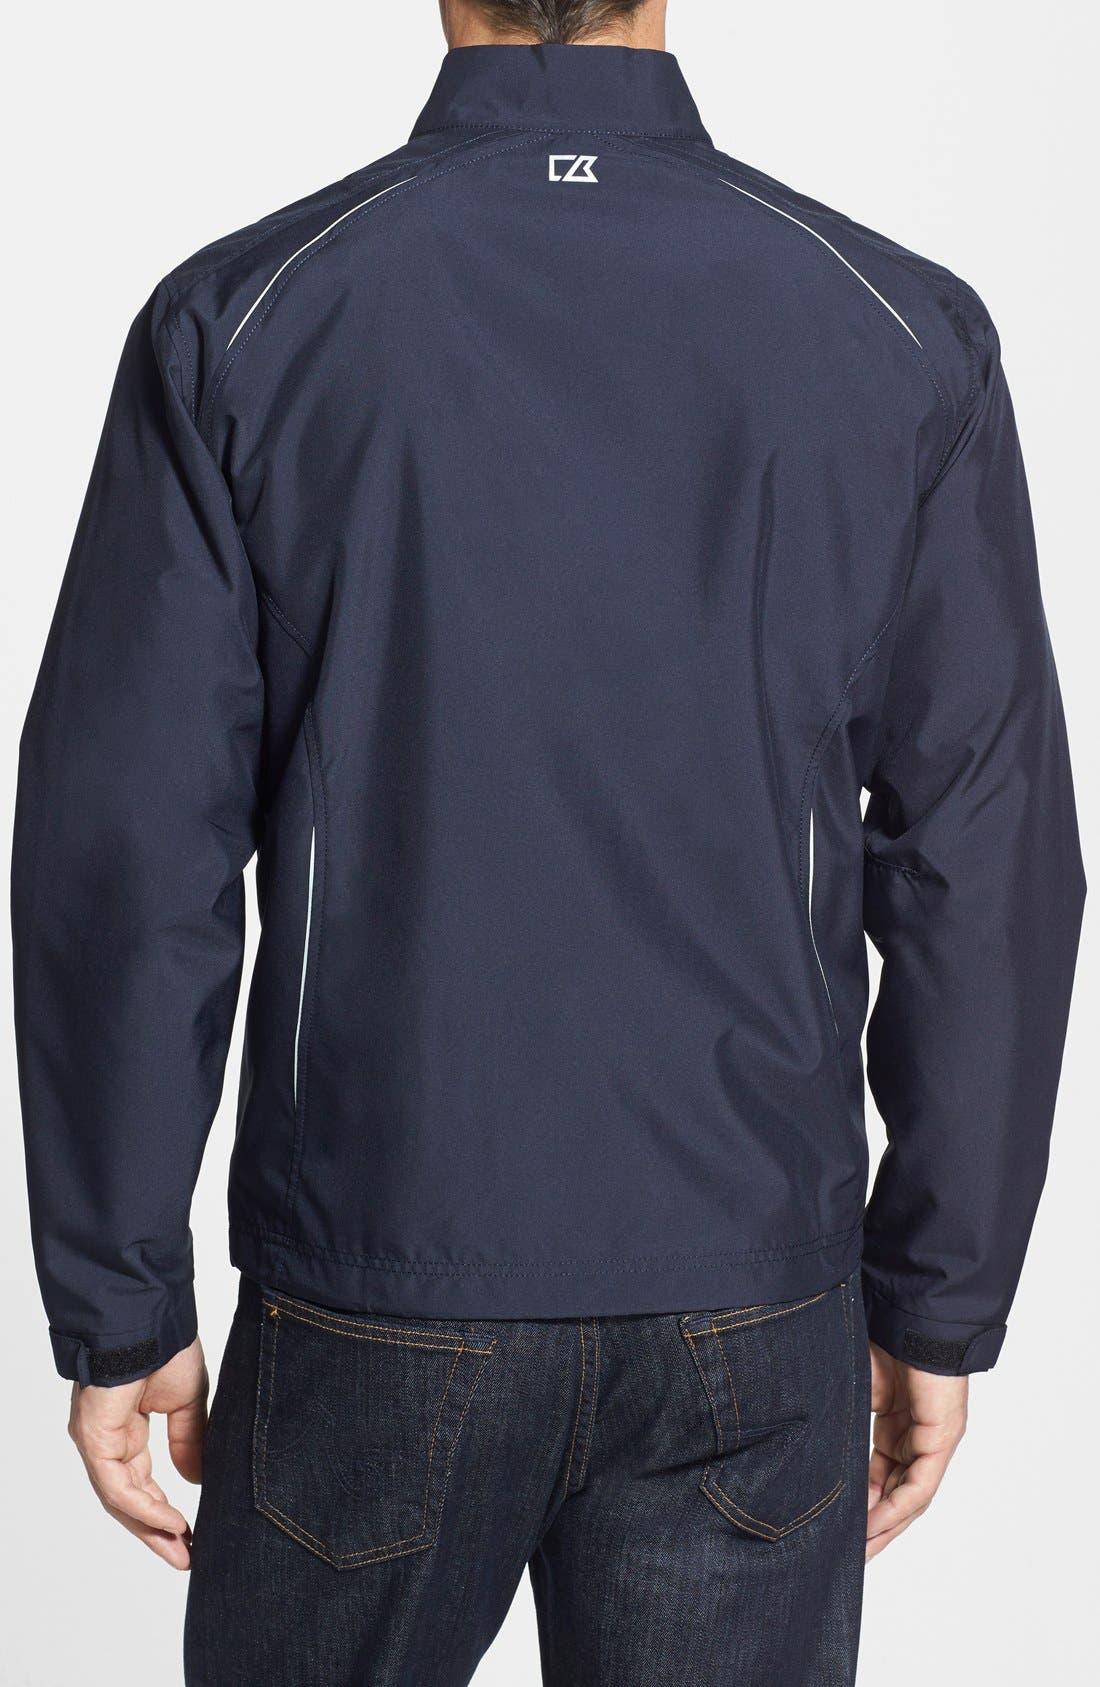 CUTTER & BUCK,                             Denver Broncos - Beacon WeatherTec Wind & Water Resistant Jacket,                             Alternate thumbnail 2, color,                             420